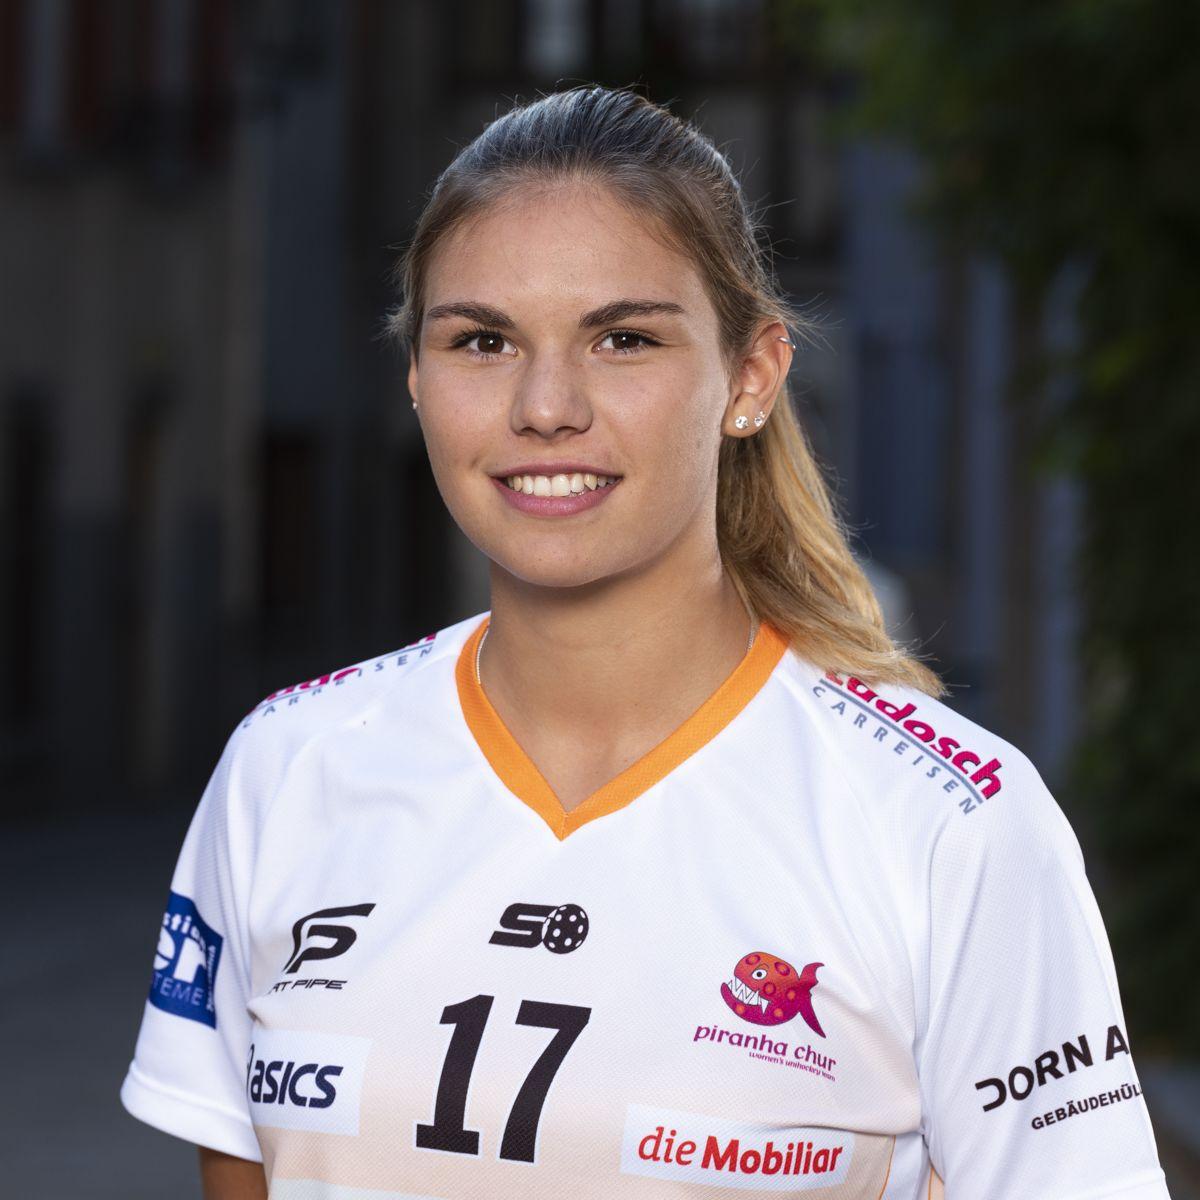 Luana Rensch #17_NLA_piranha Chur_Saison 2019-2020_1200x1200_01.jpg